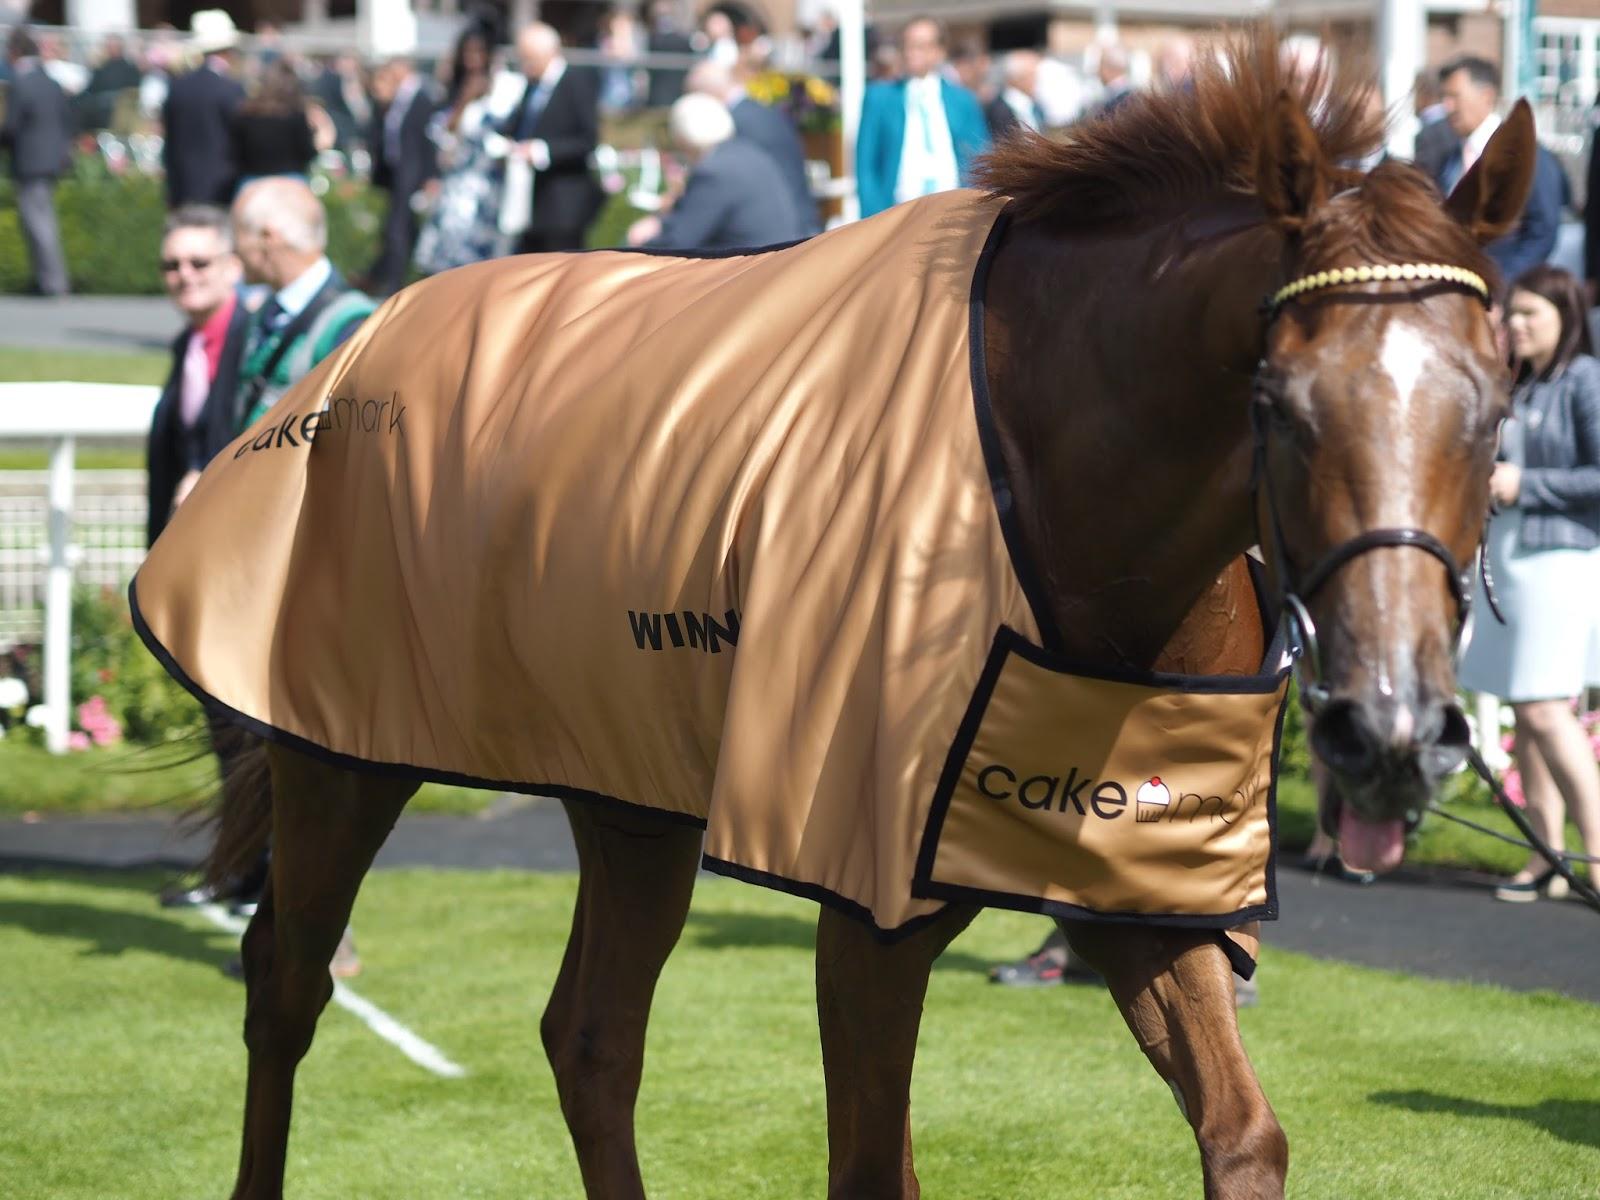 York races, Novoman in winners blanket